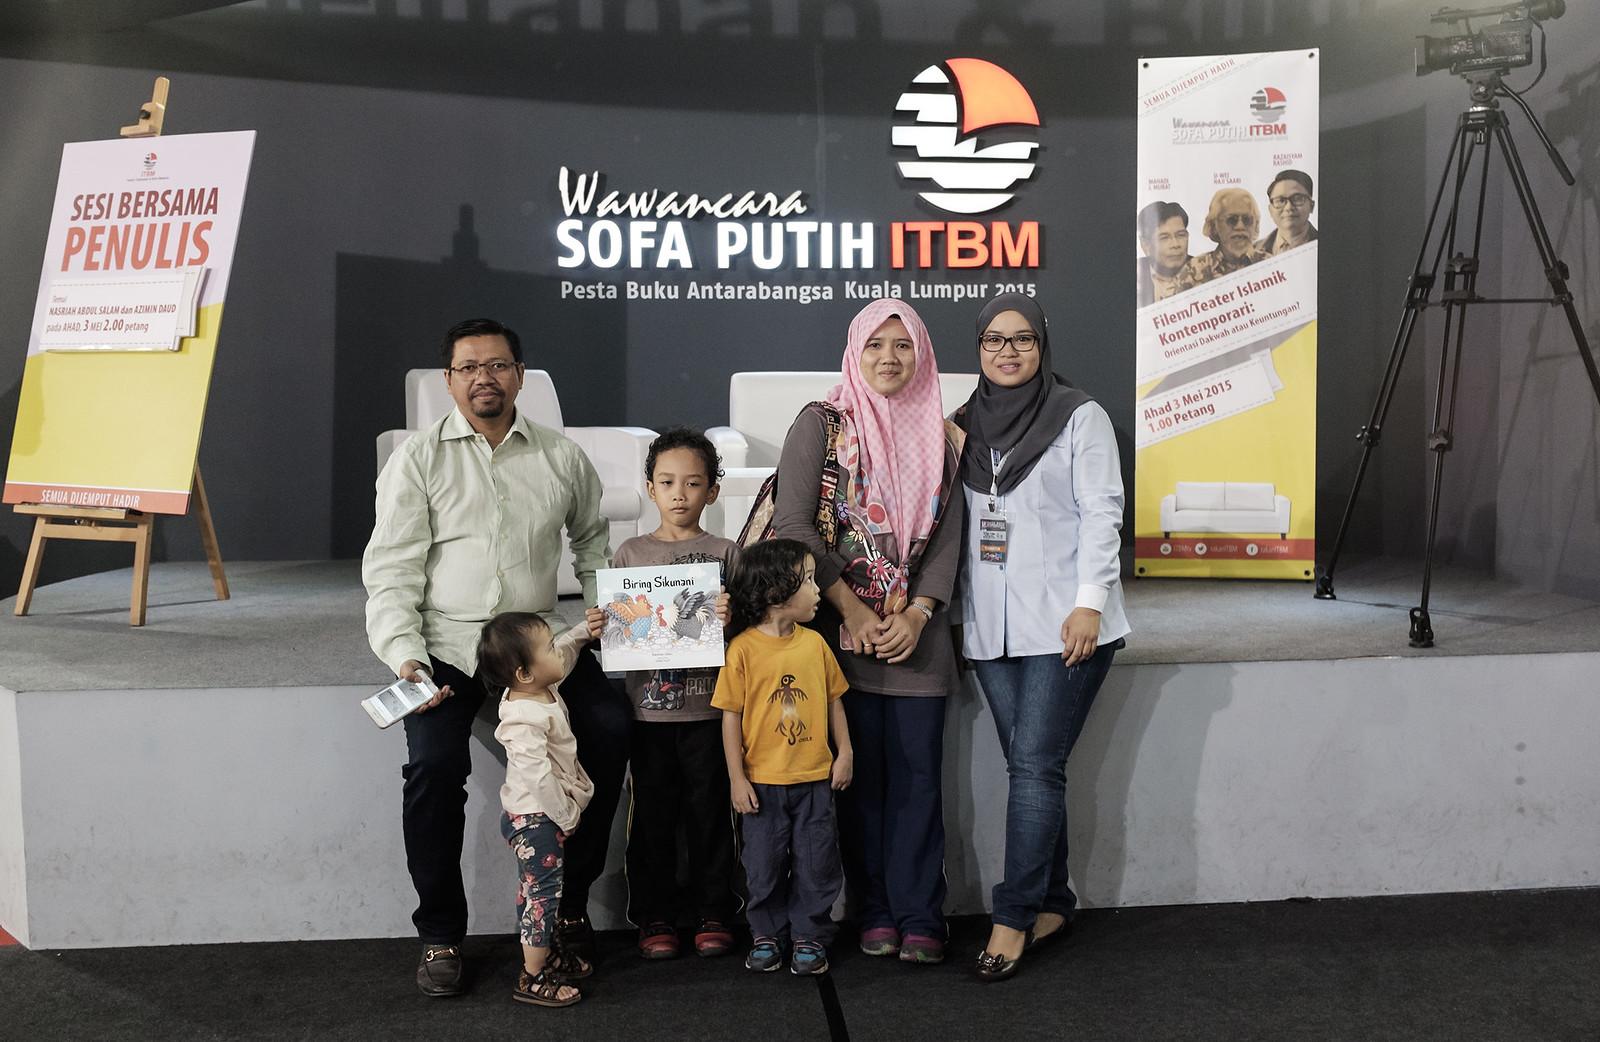 Family Photography | Pesta Buku Kuala Lumpur